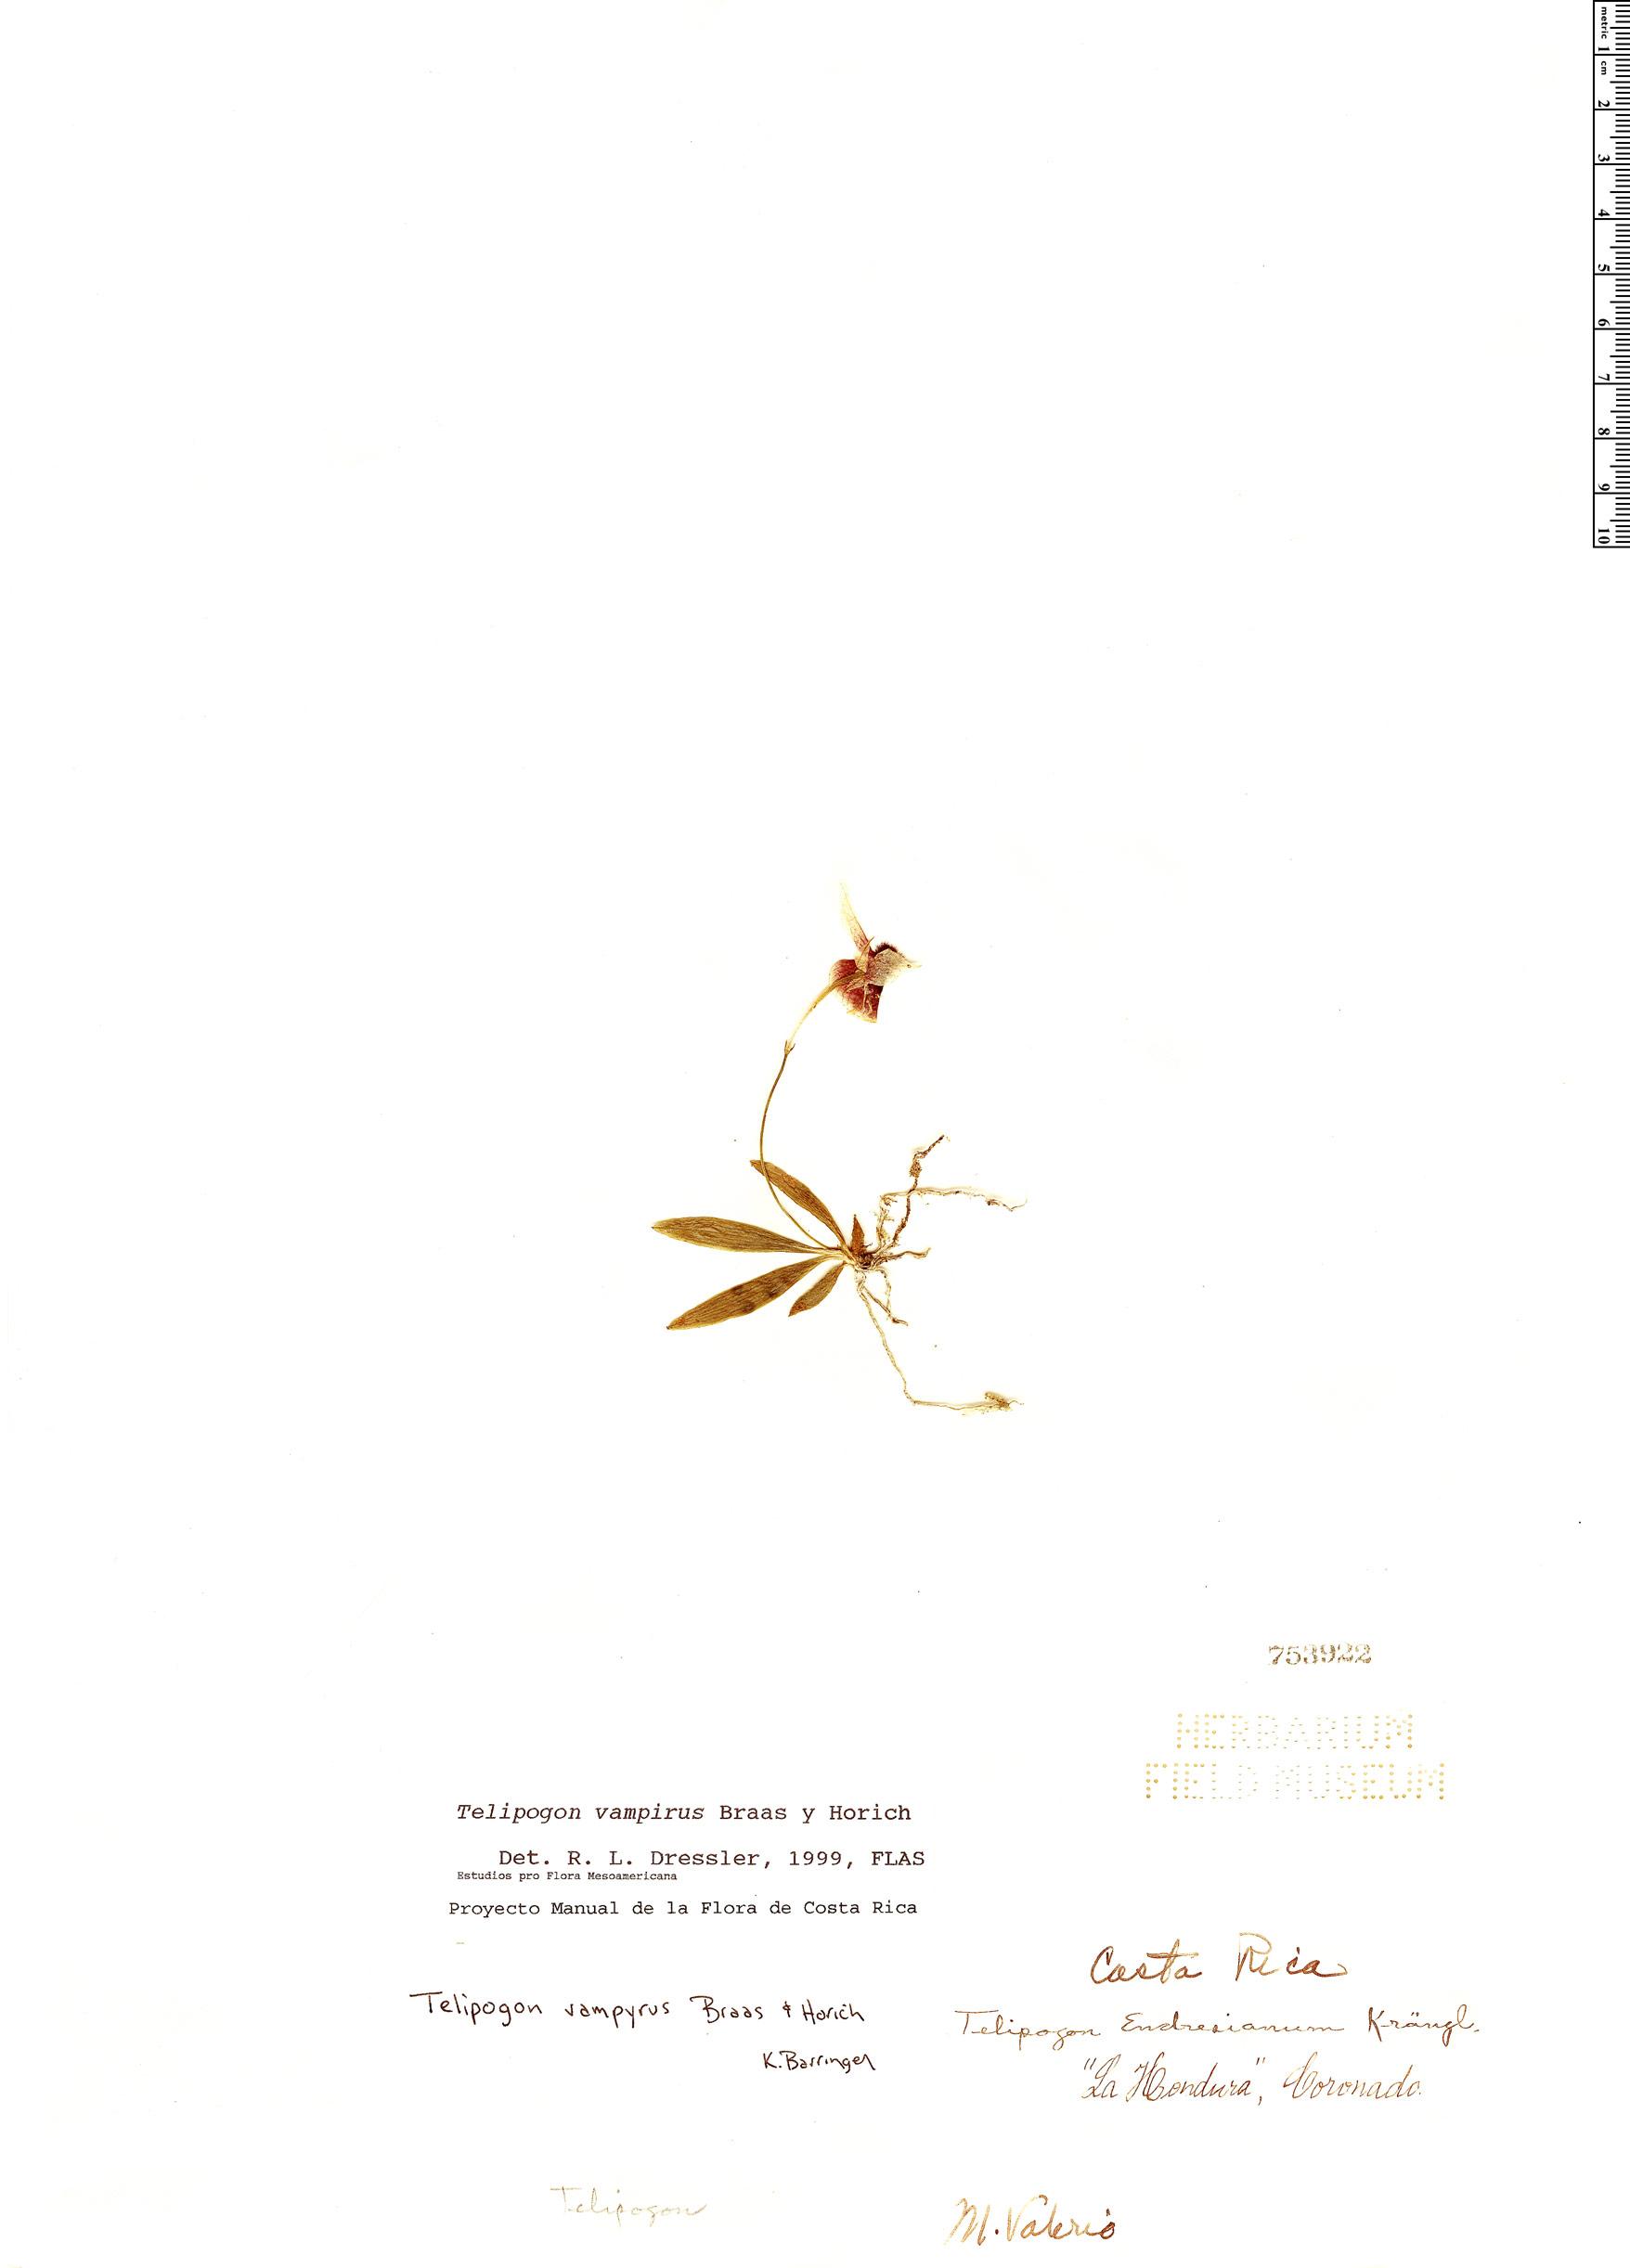 Specimen: Telipogon vampyrus